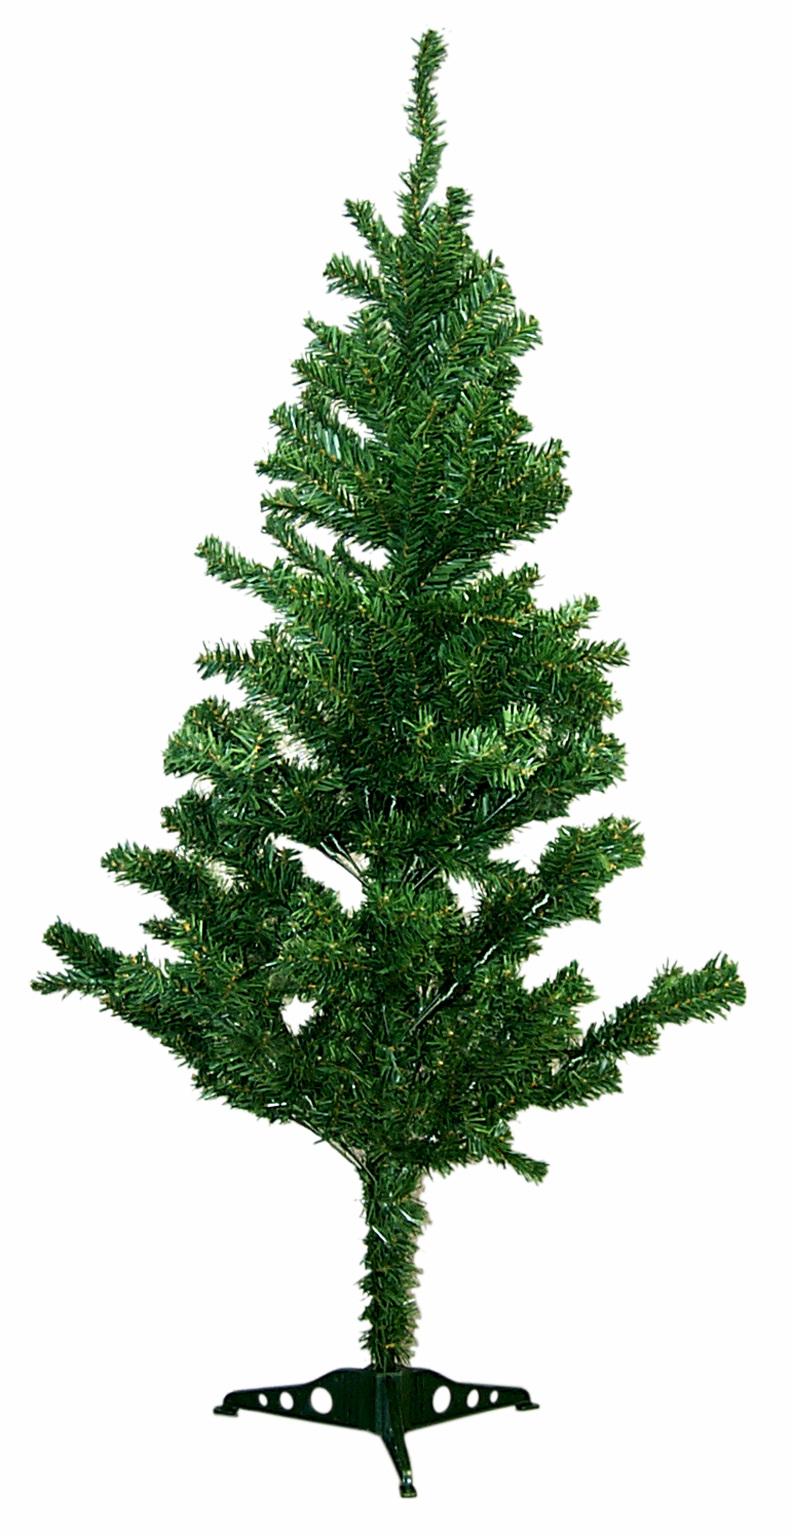 4' CHRISTMAS Tree with Metal Stand [1487762]